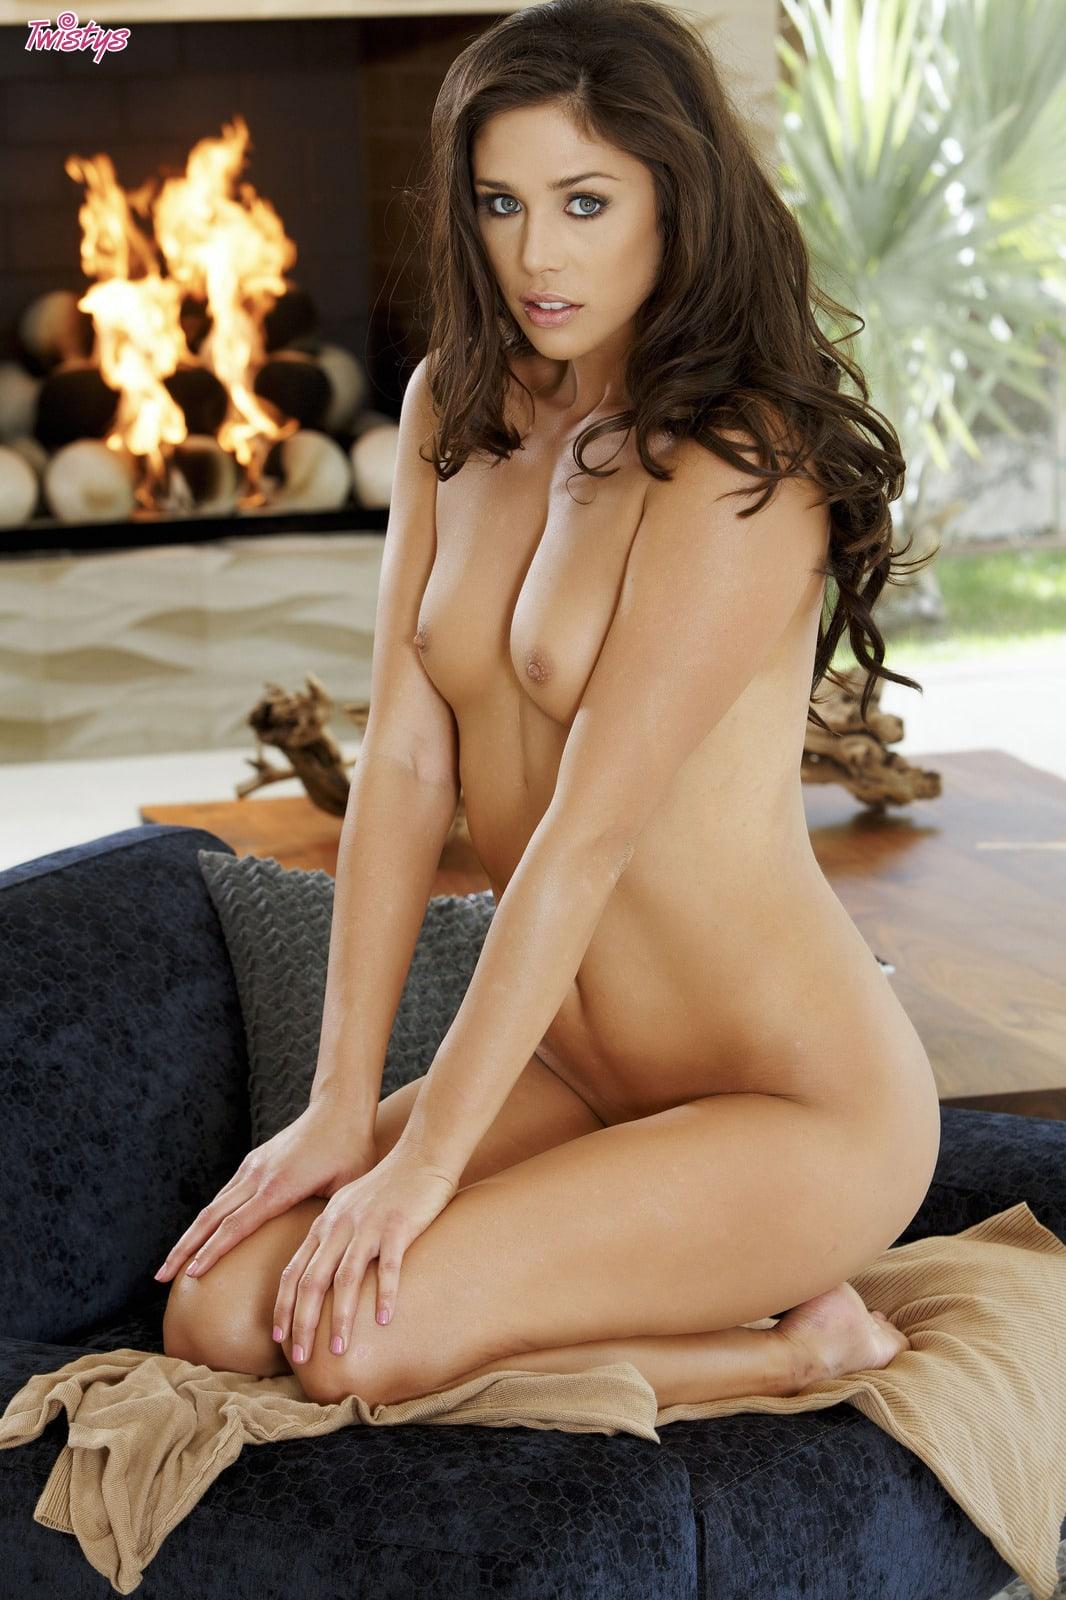 anna burns hooters nude